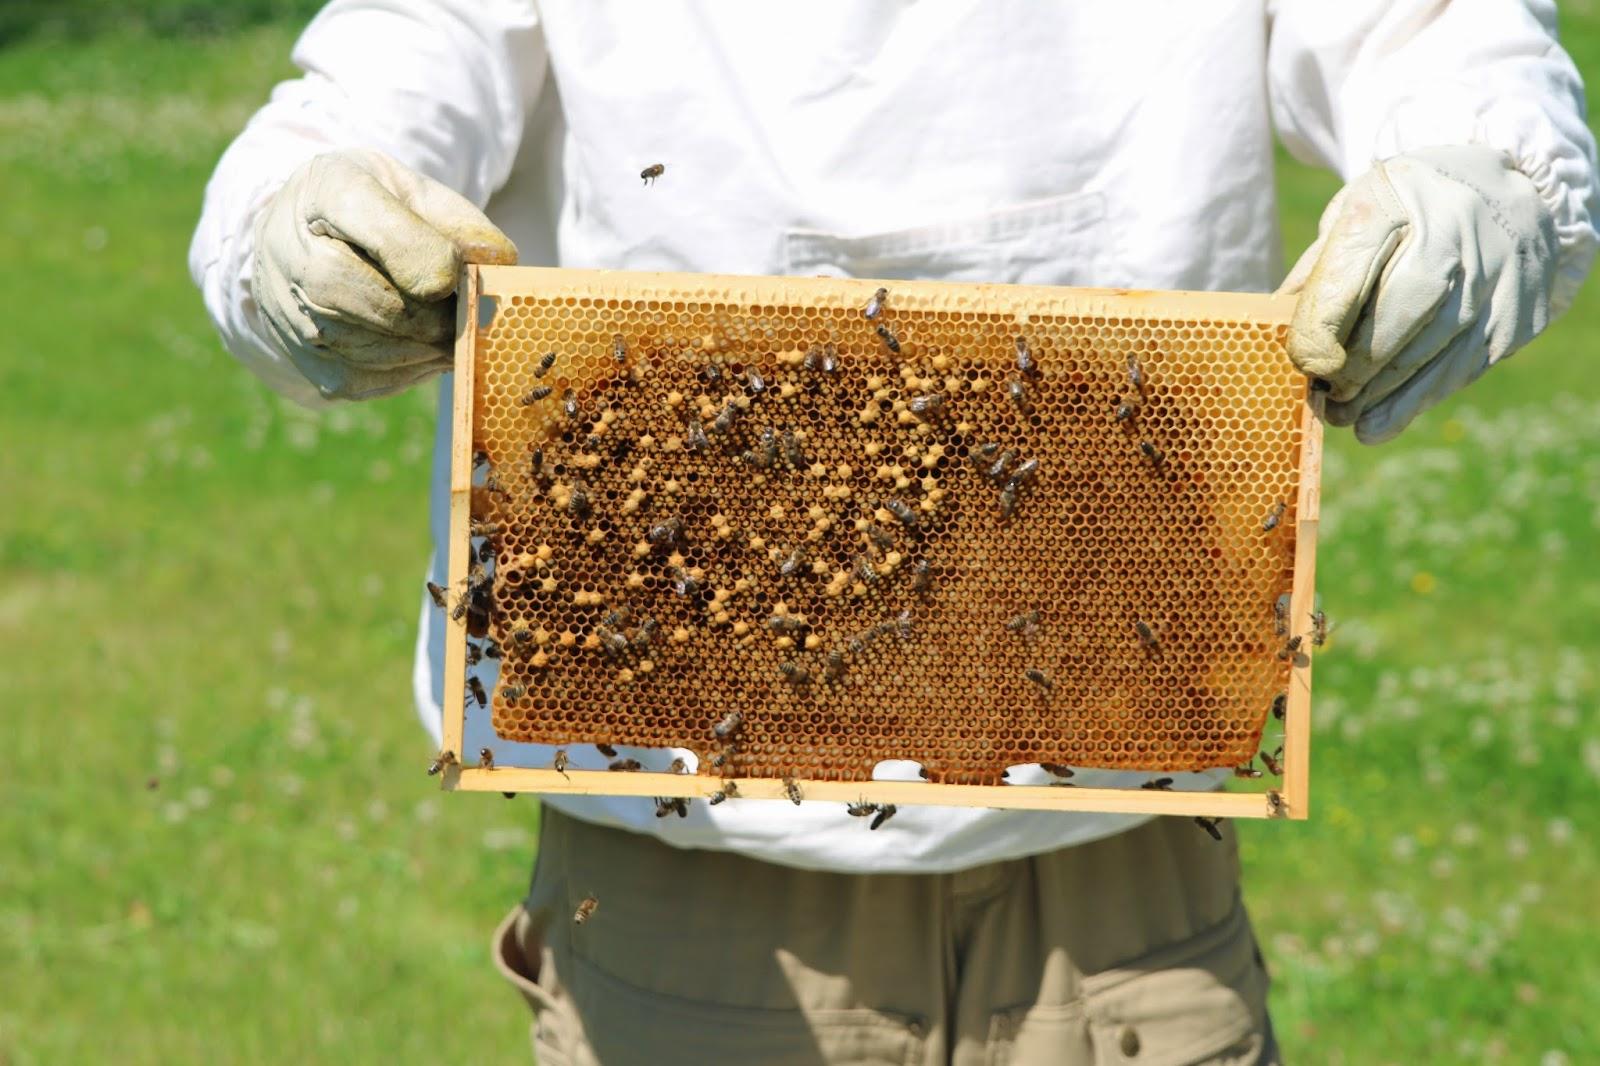 honigbienenblog time is honey ist die chefin aus dem. Black Bedroom Furniture Sets. Home Design Ideas